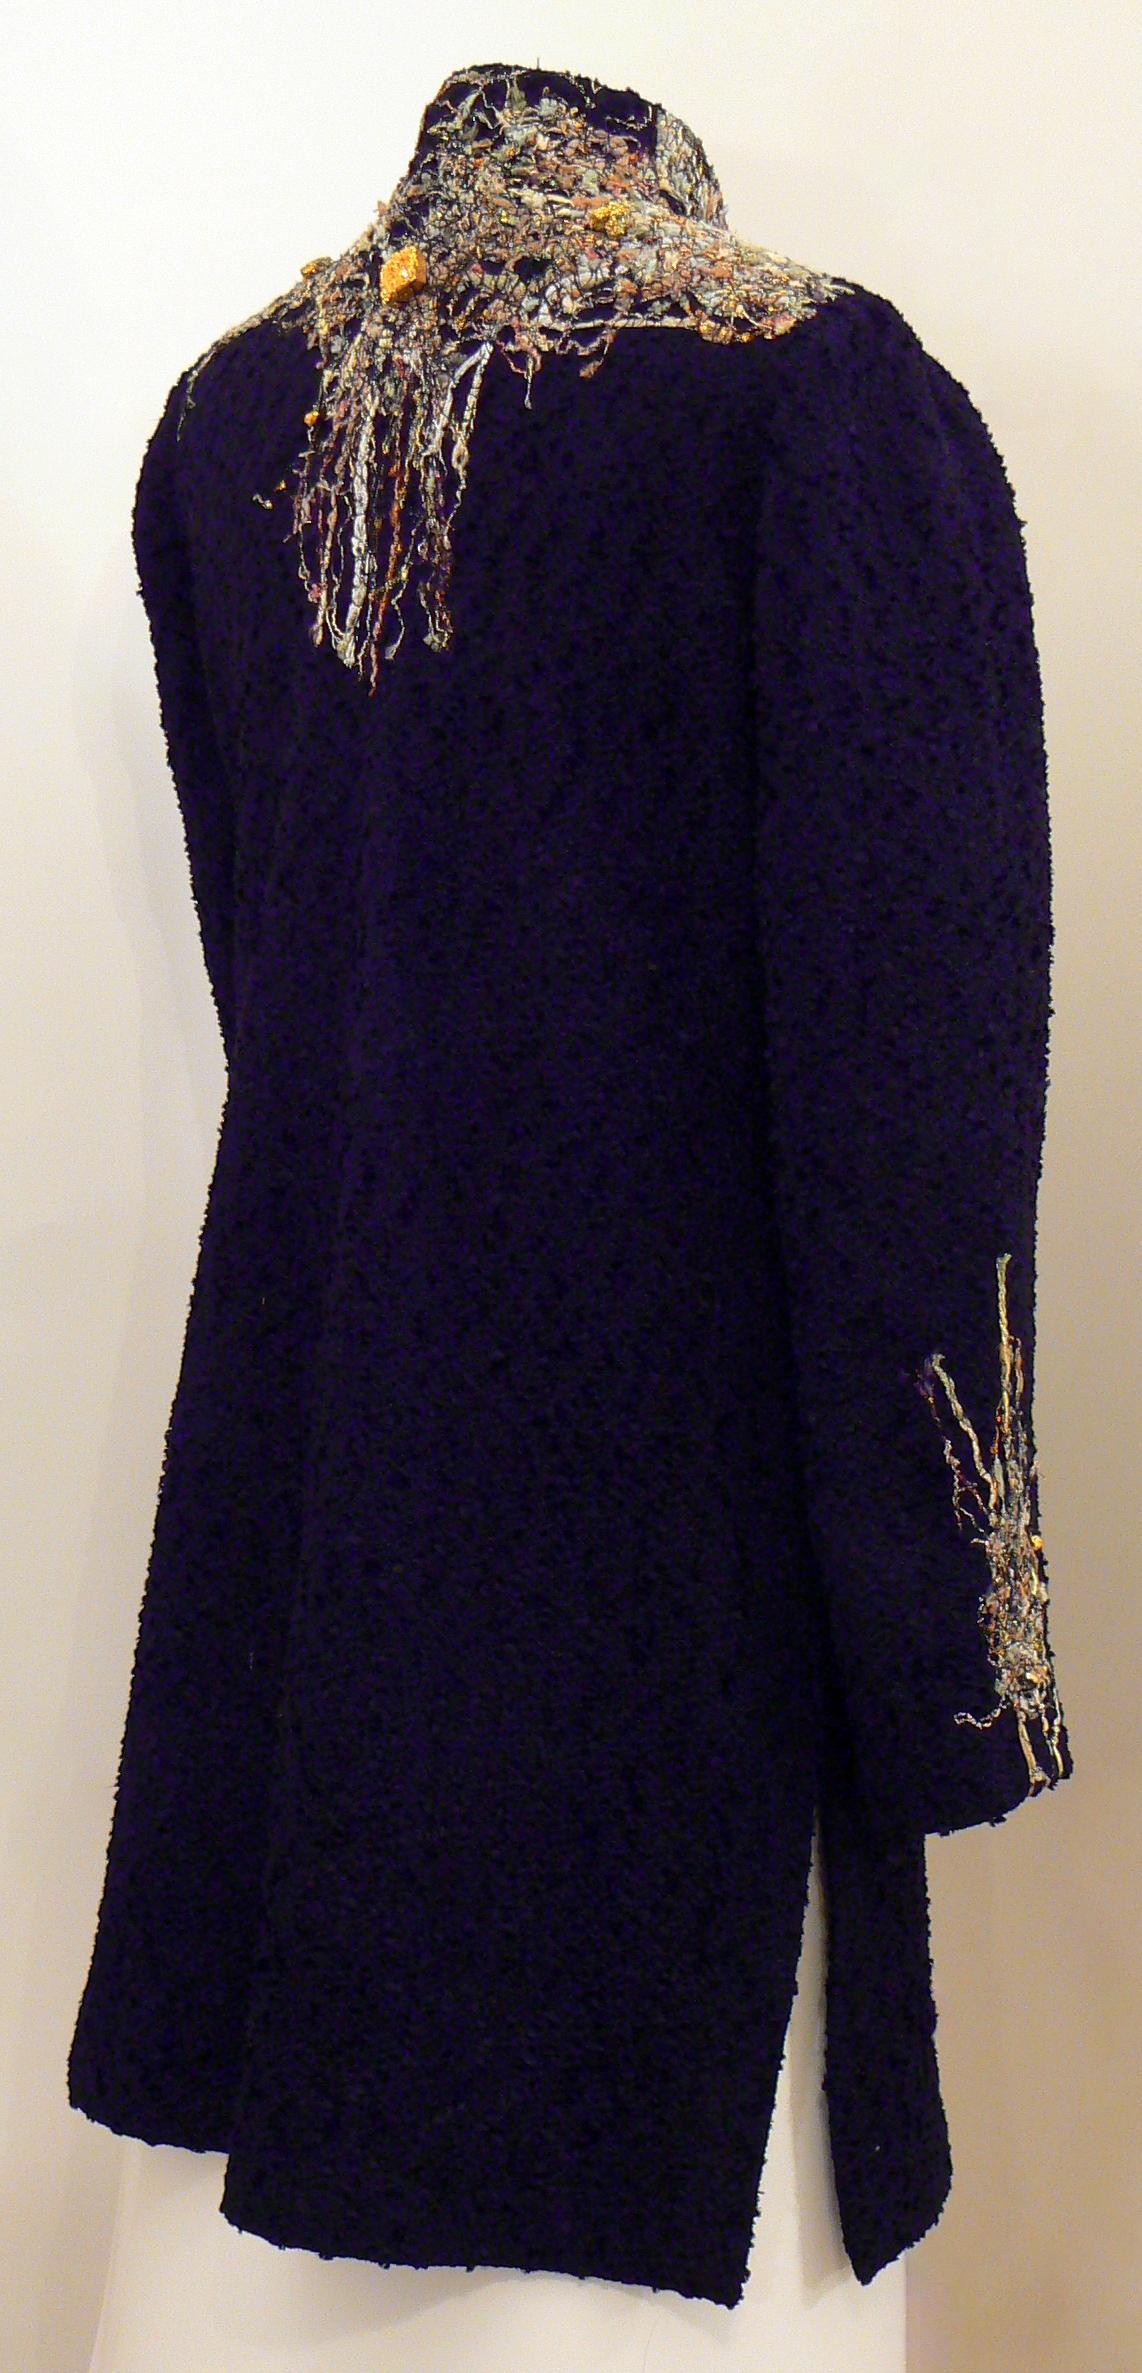 Handwoven Clothing, Coats, Kathleen Weir-West, 29-001.JPG